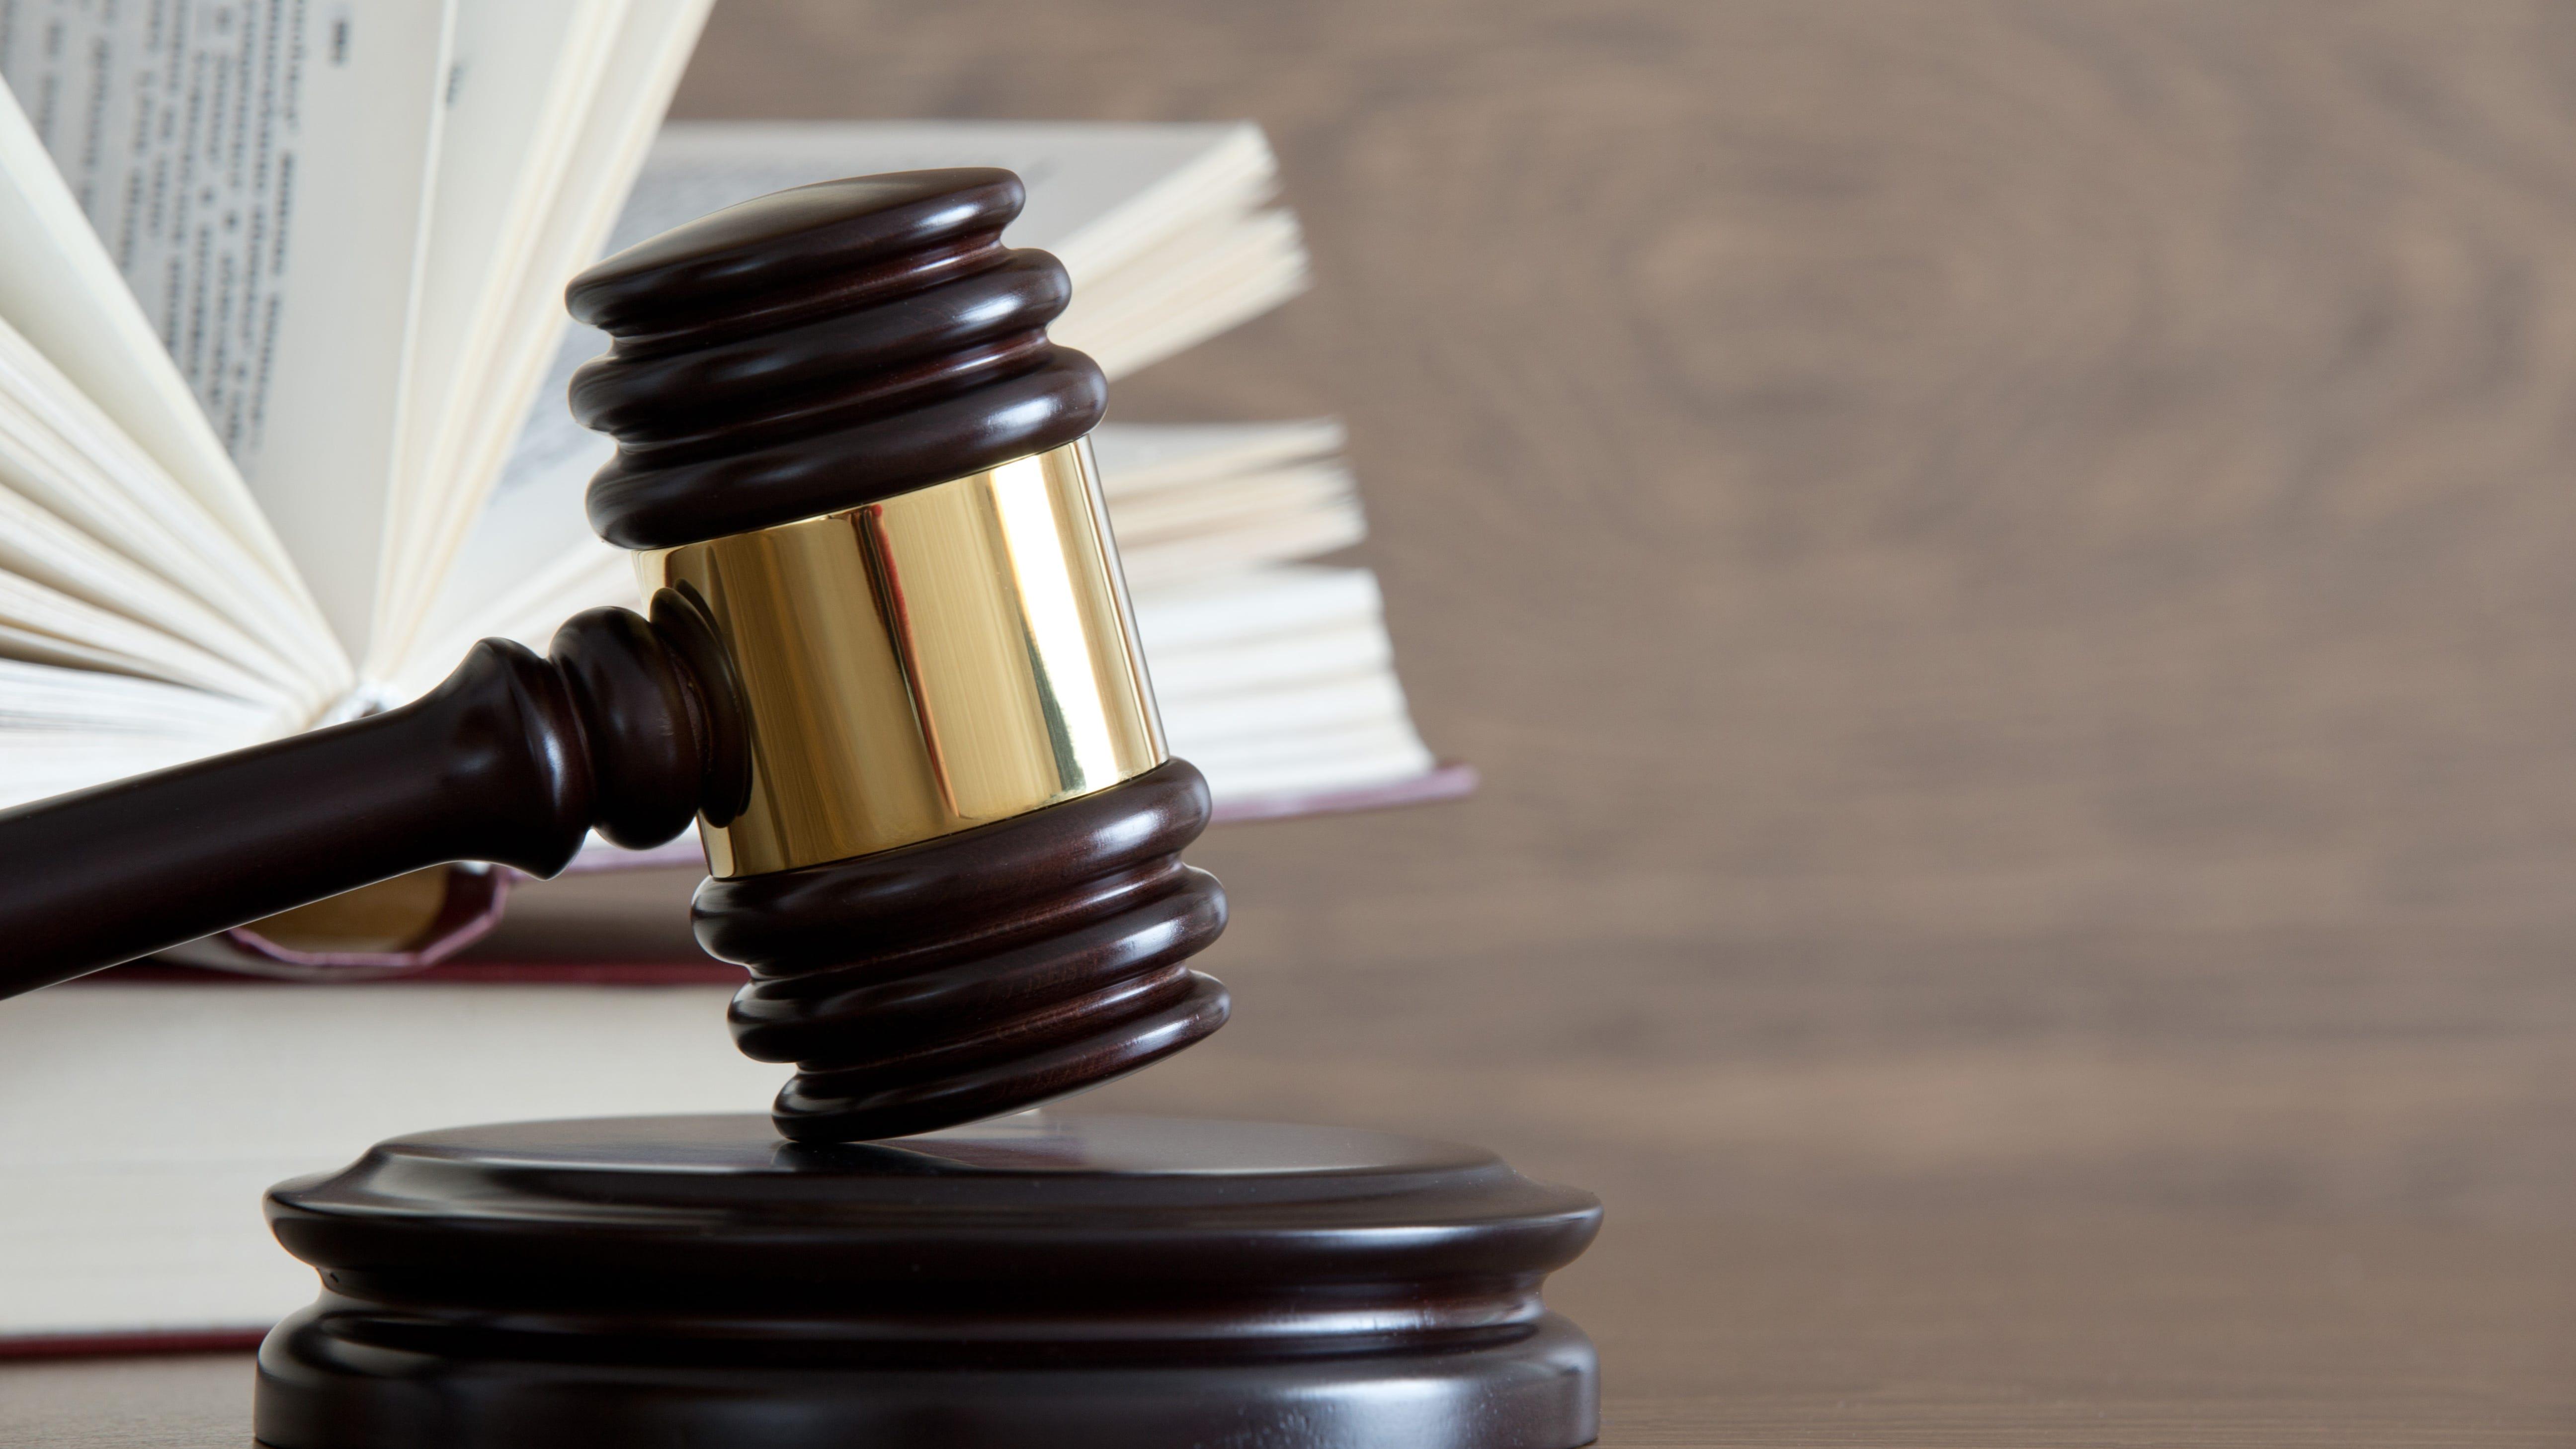 Is it OK to blame a domestic violence victim? Arizona's Supreme Court thinks so